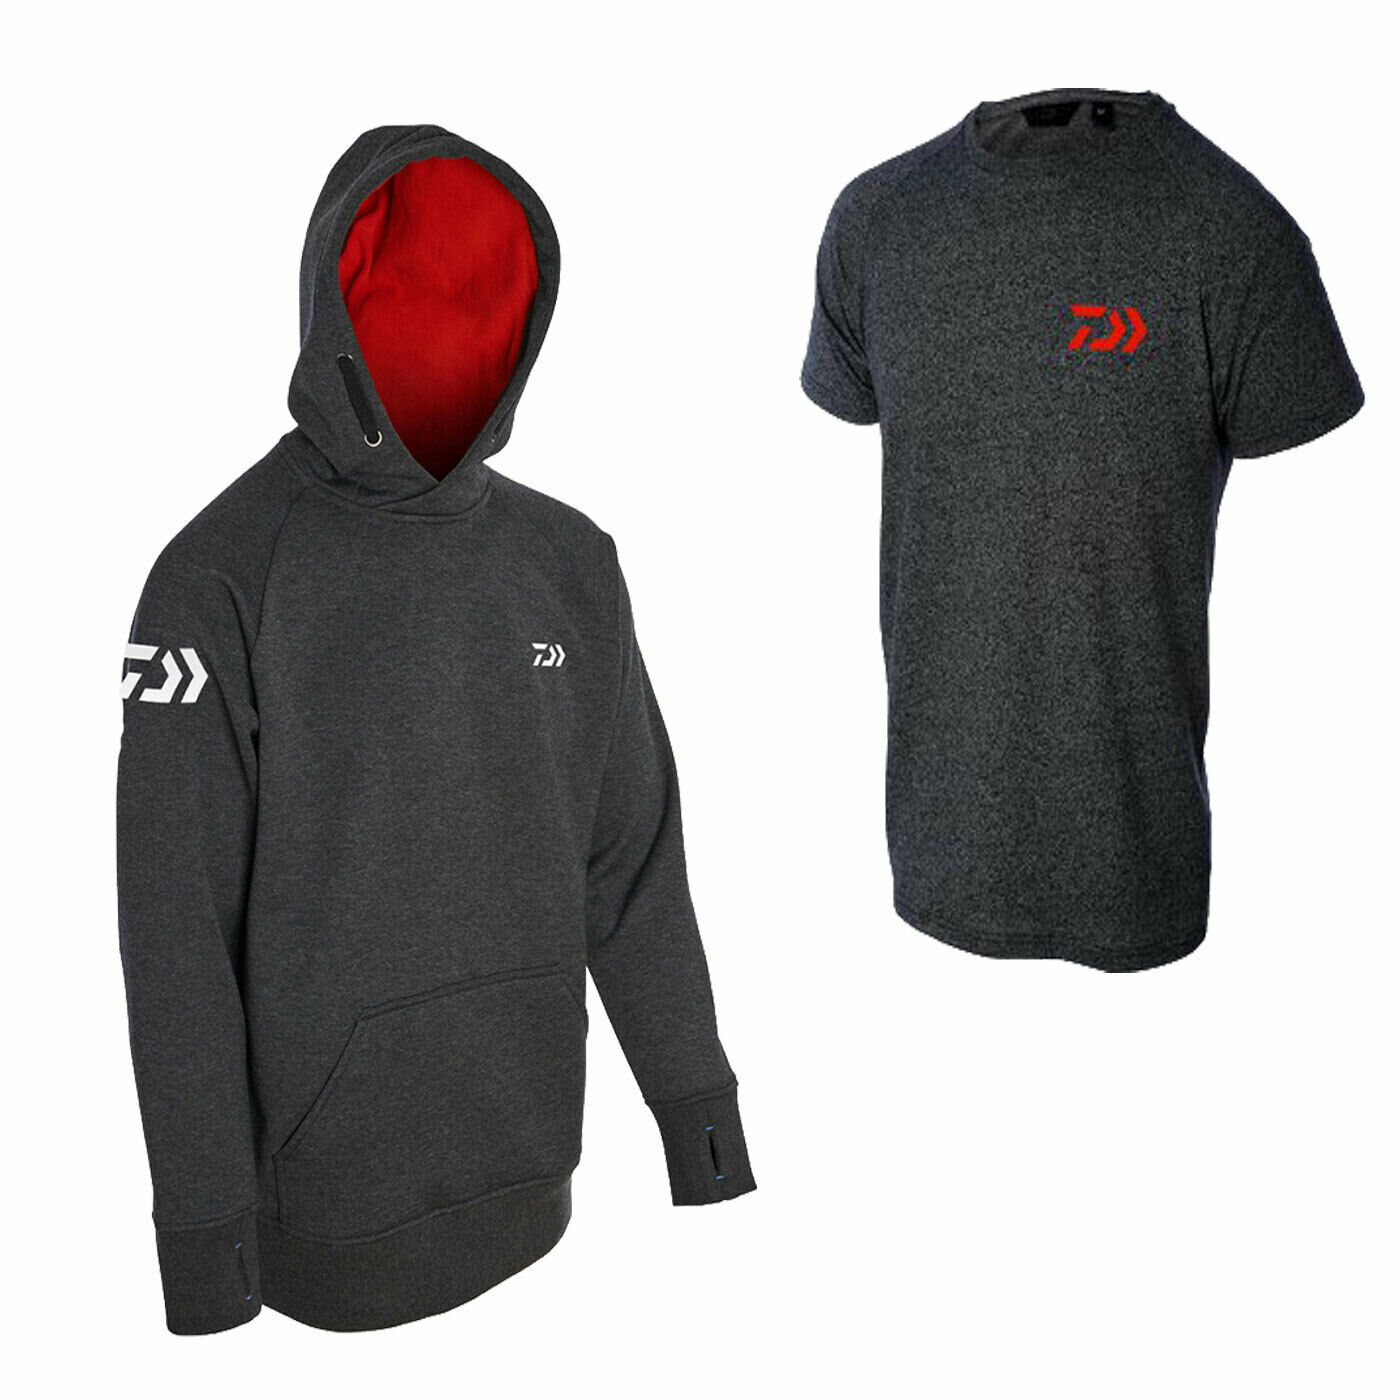 Daiwa Match Hoodie + T-Shirt Combo New 2019 - Free Delivery